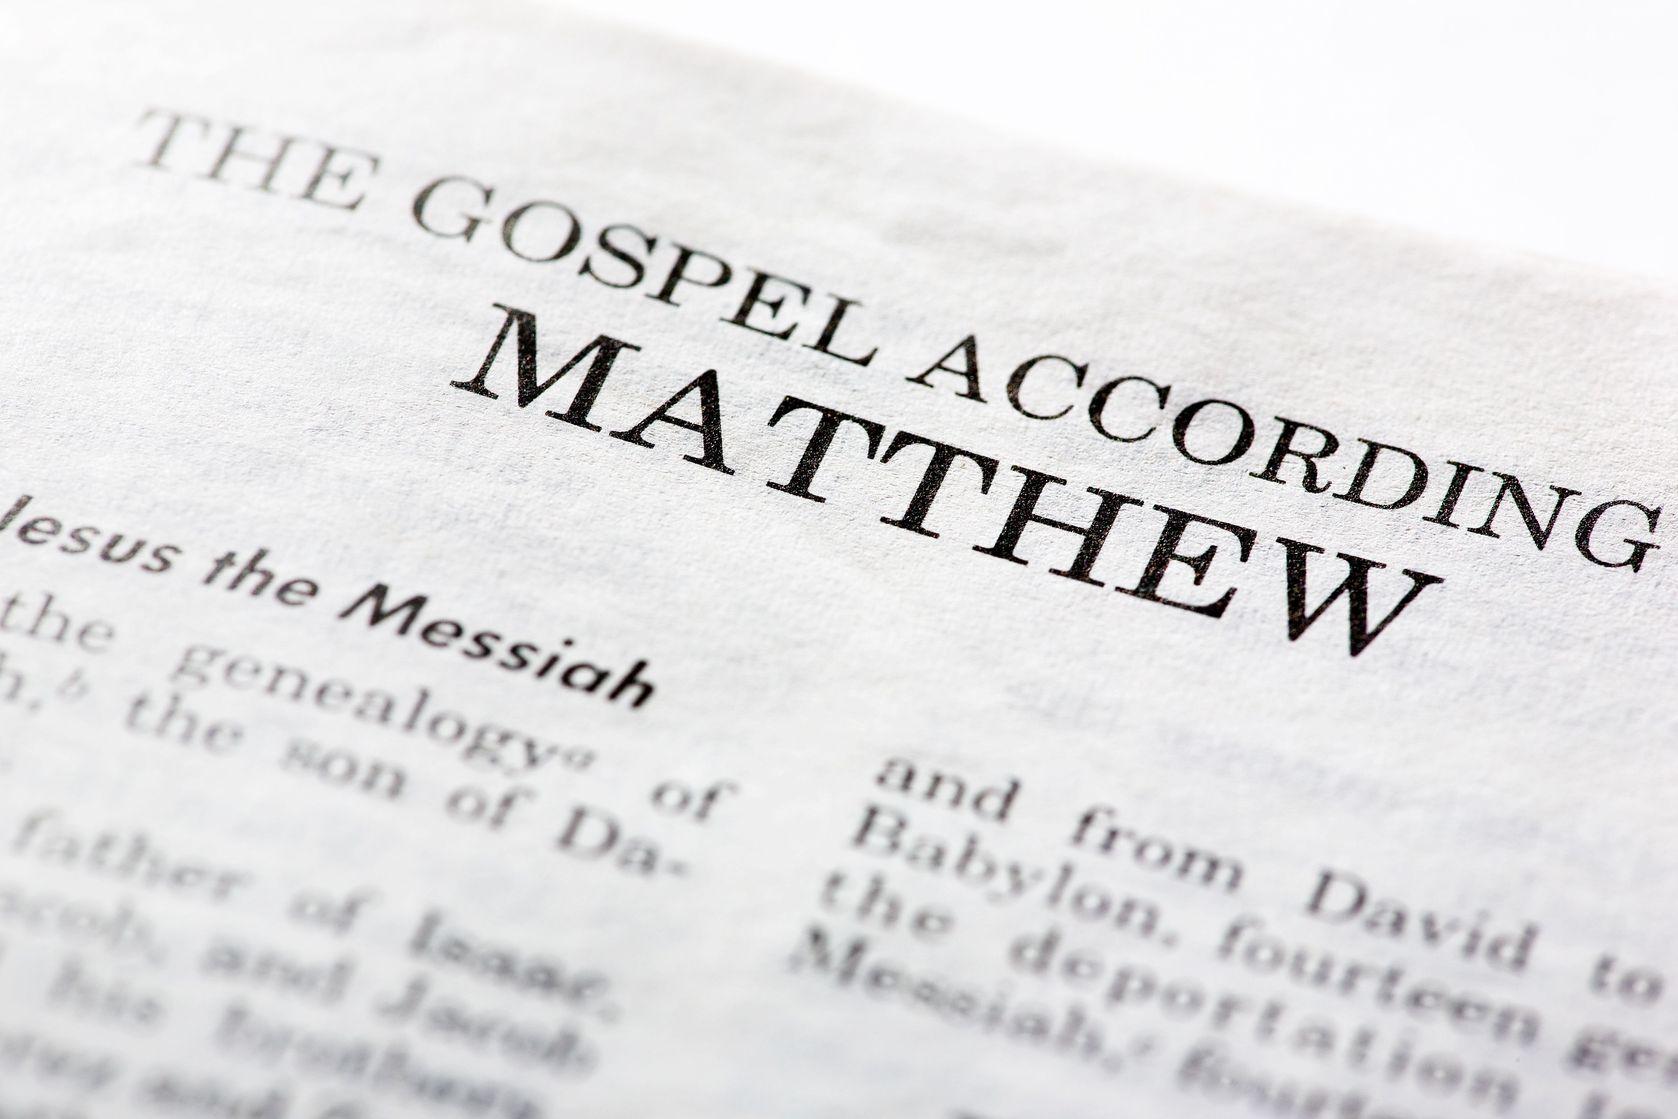 writer of matthews gospel